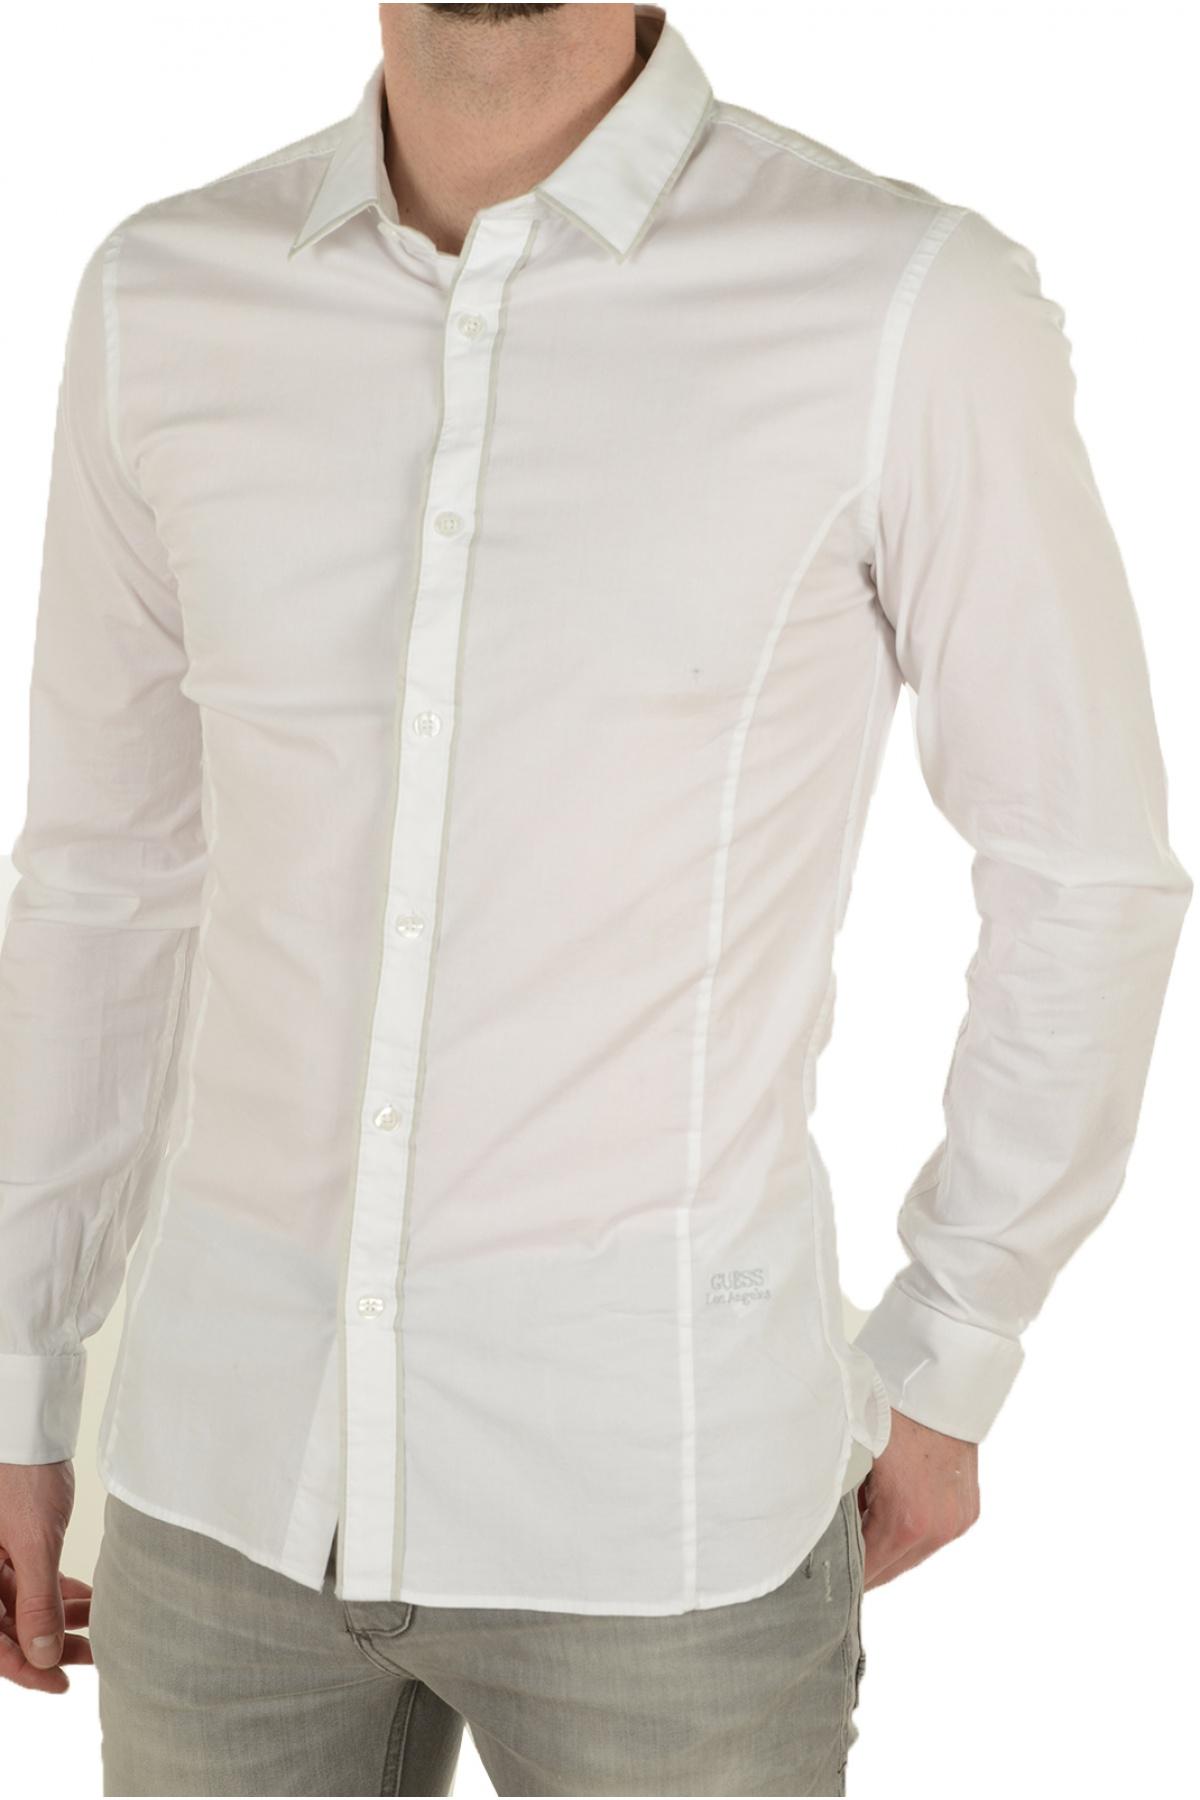 Chemises Guess Jeans Homme S,xxl